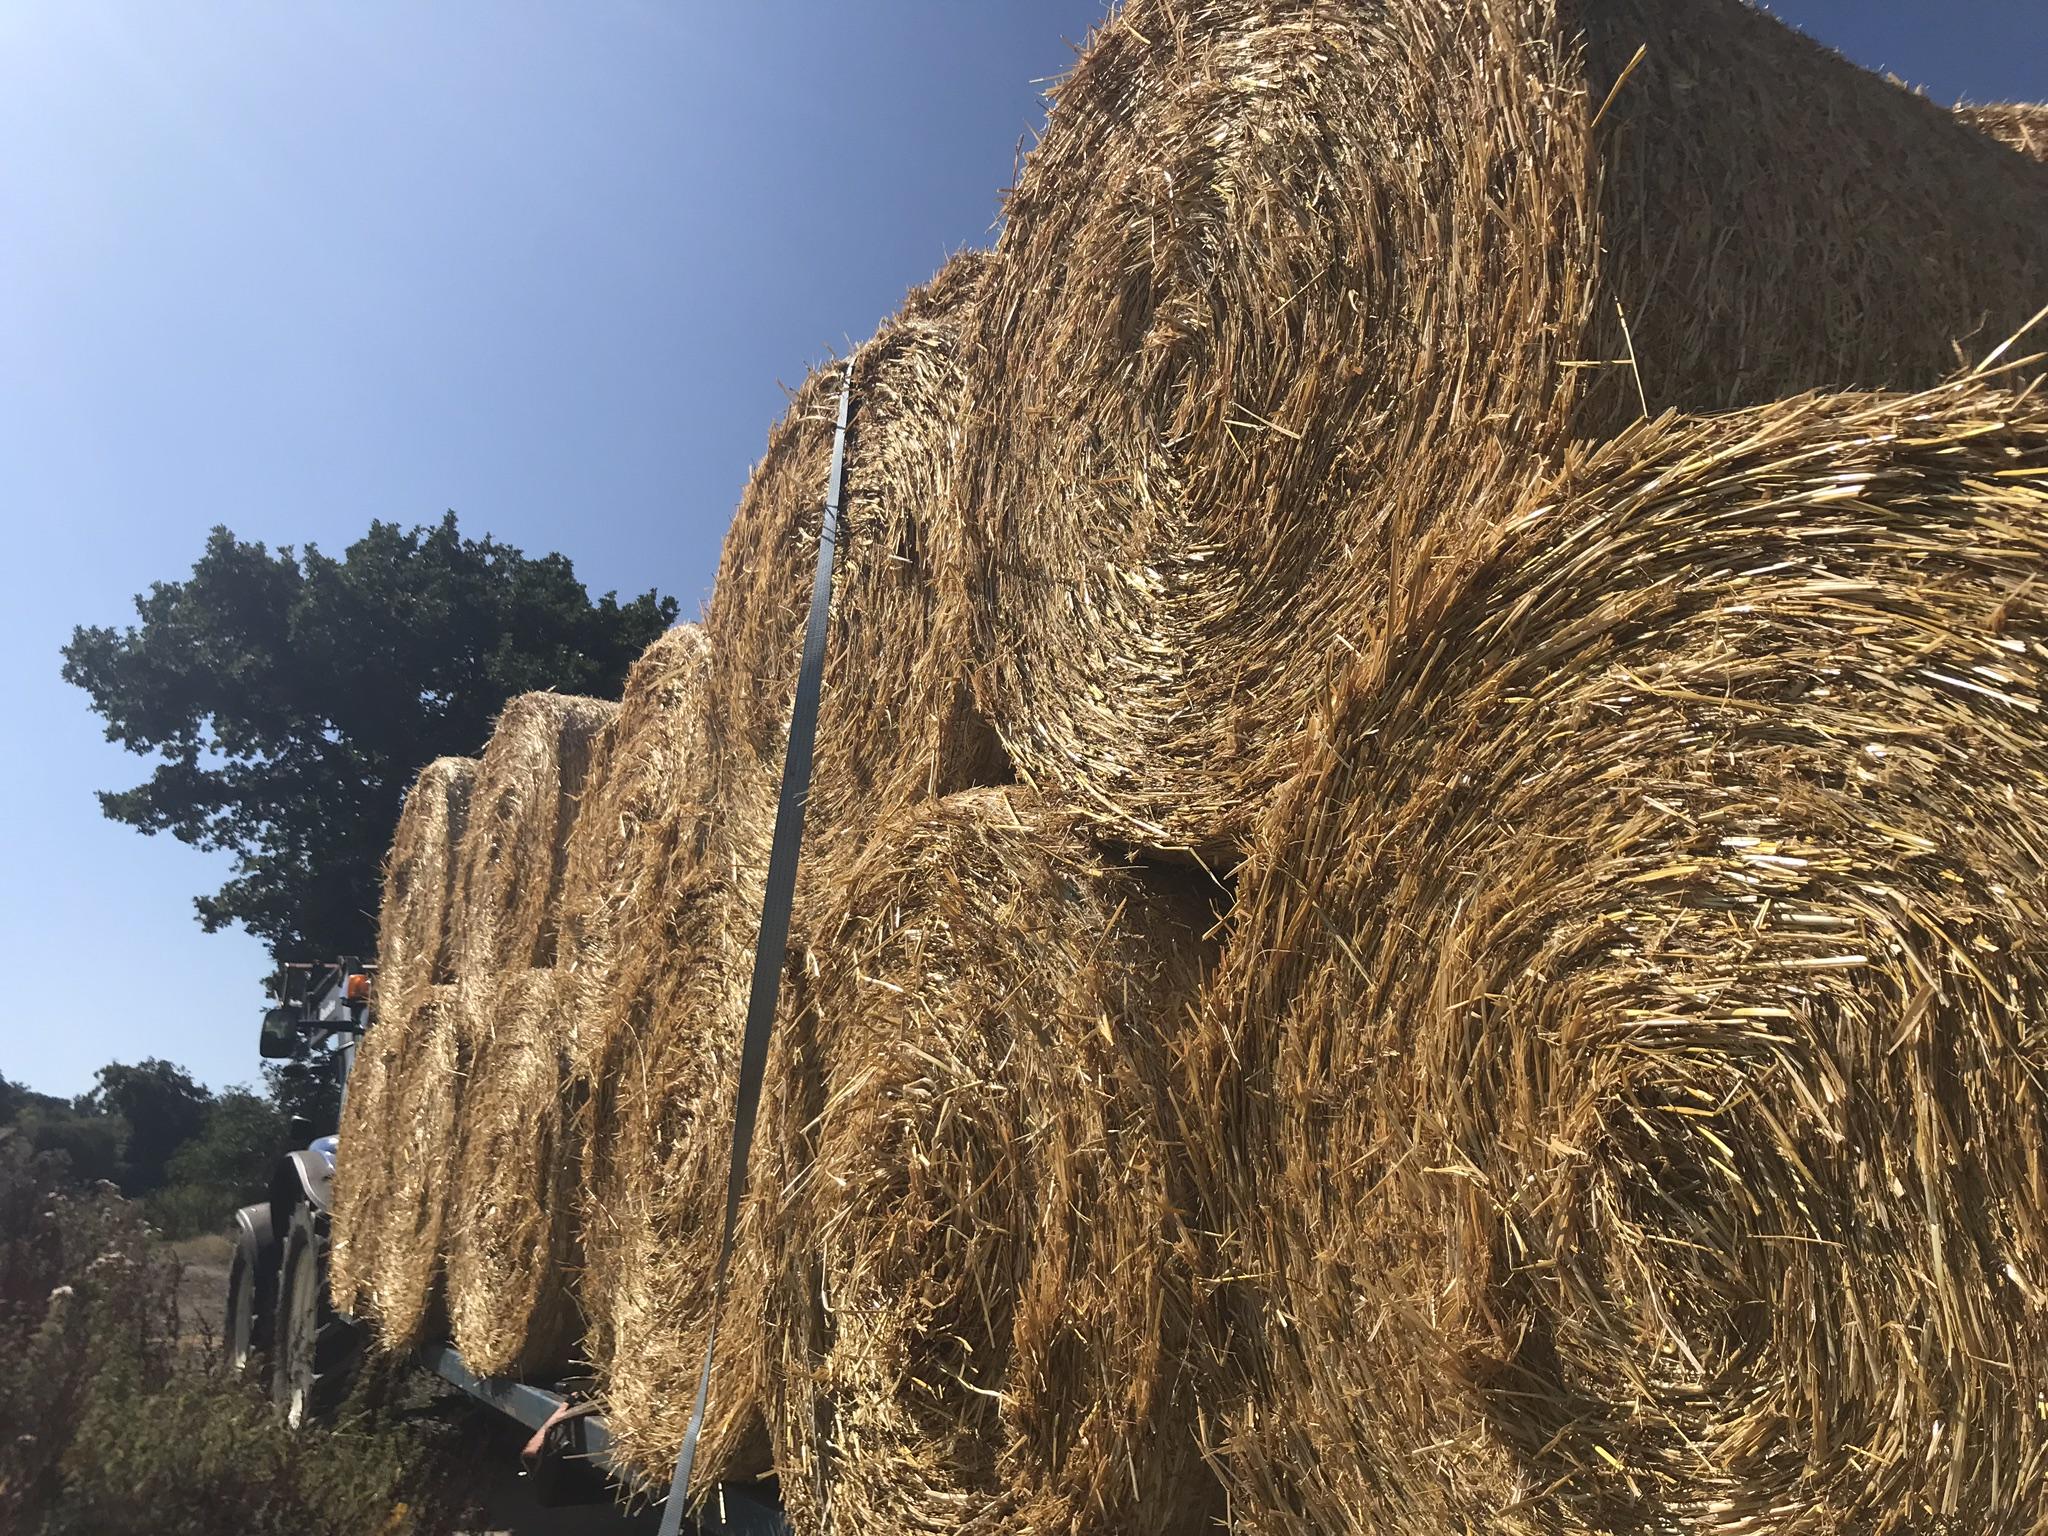 Bramble-farm-oat-straw-turkey-bedding